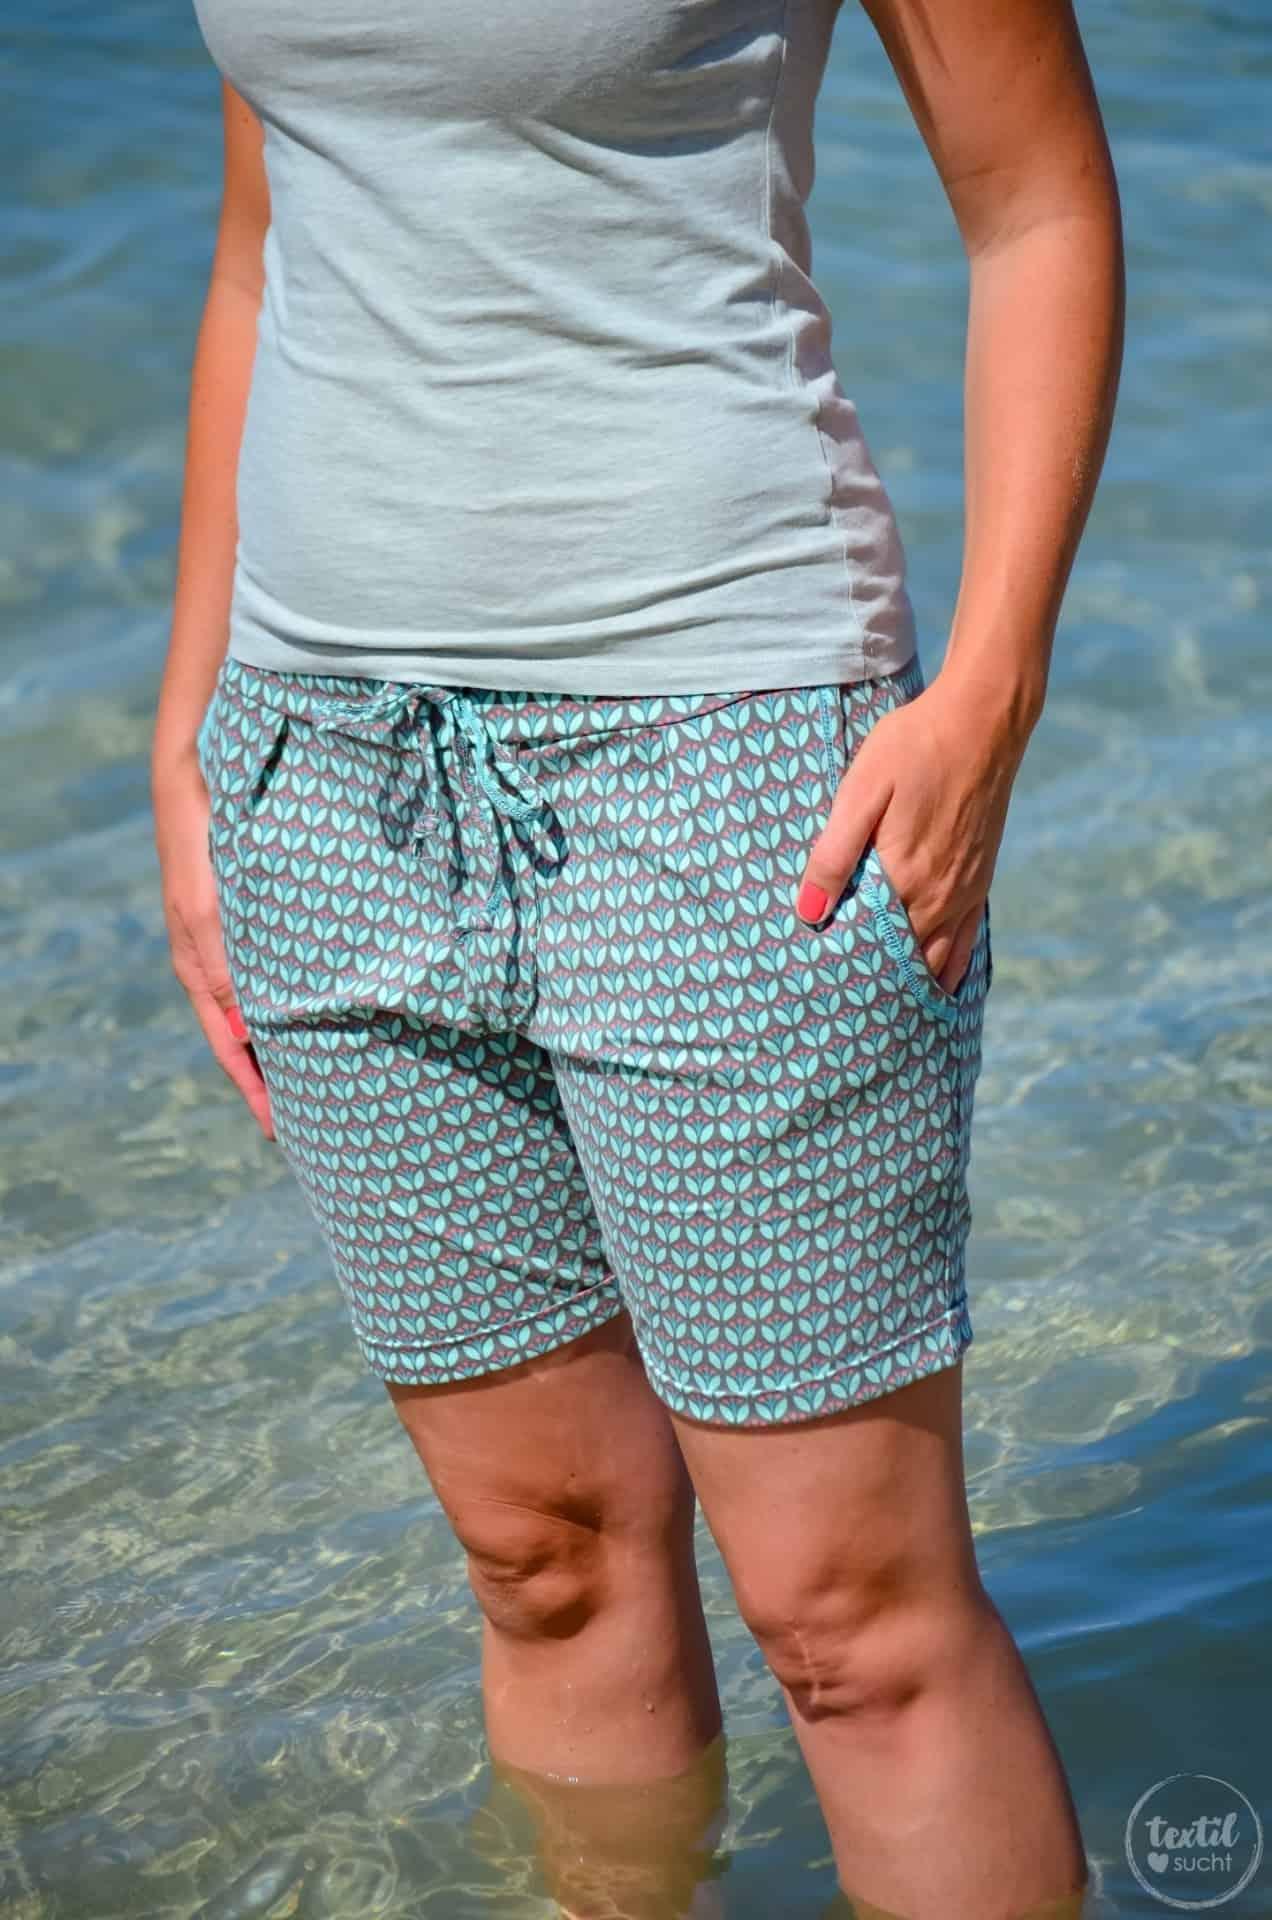 Nähen für den Strand: Schnittmuster Velara als Shorts - Bild 2   textilsucht.de